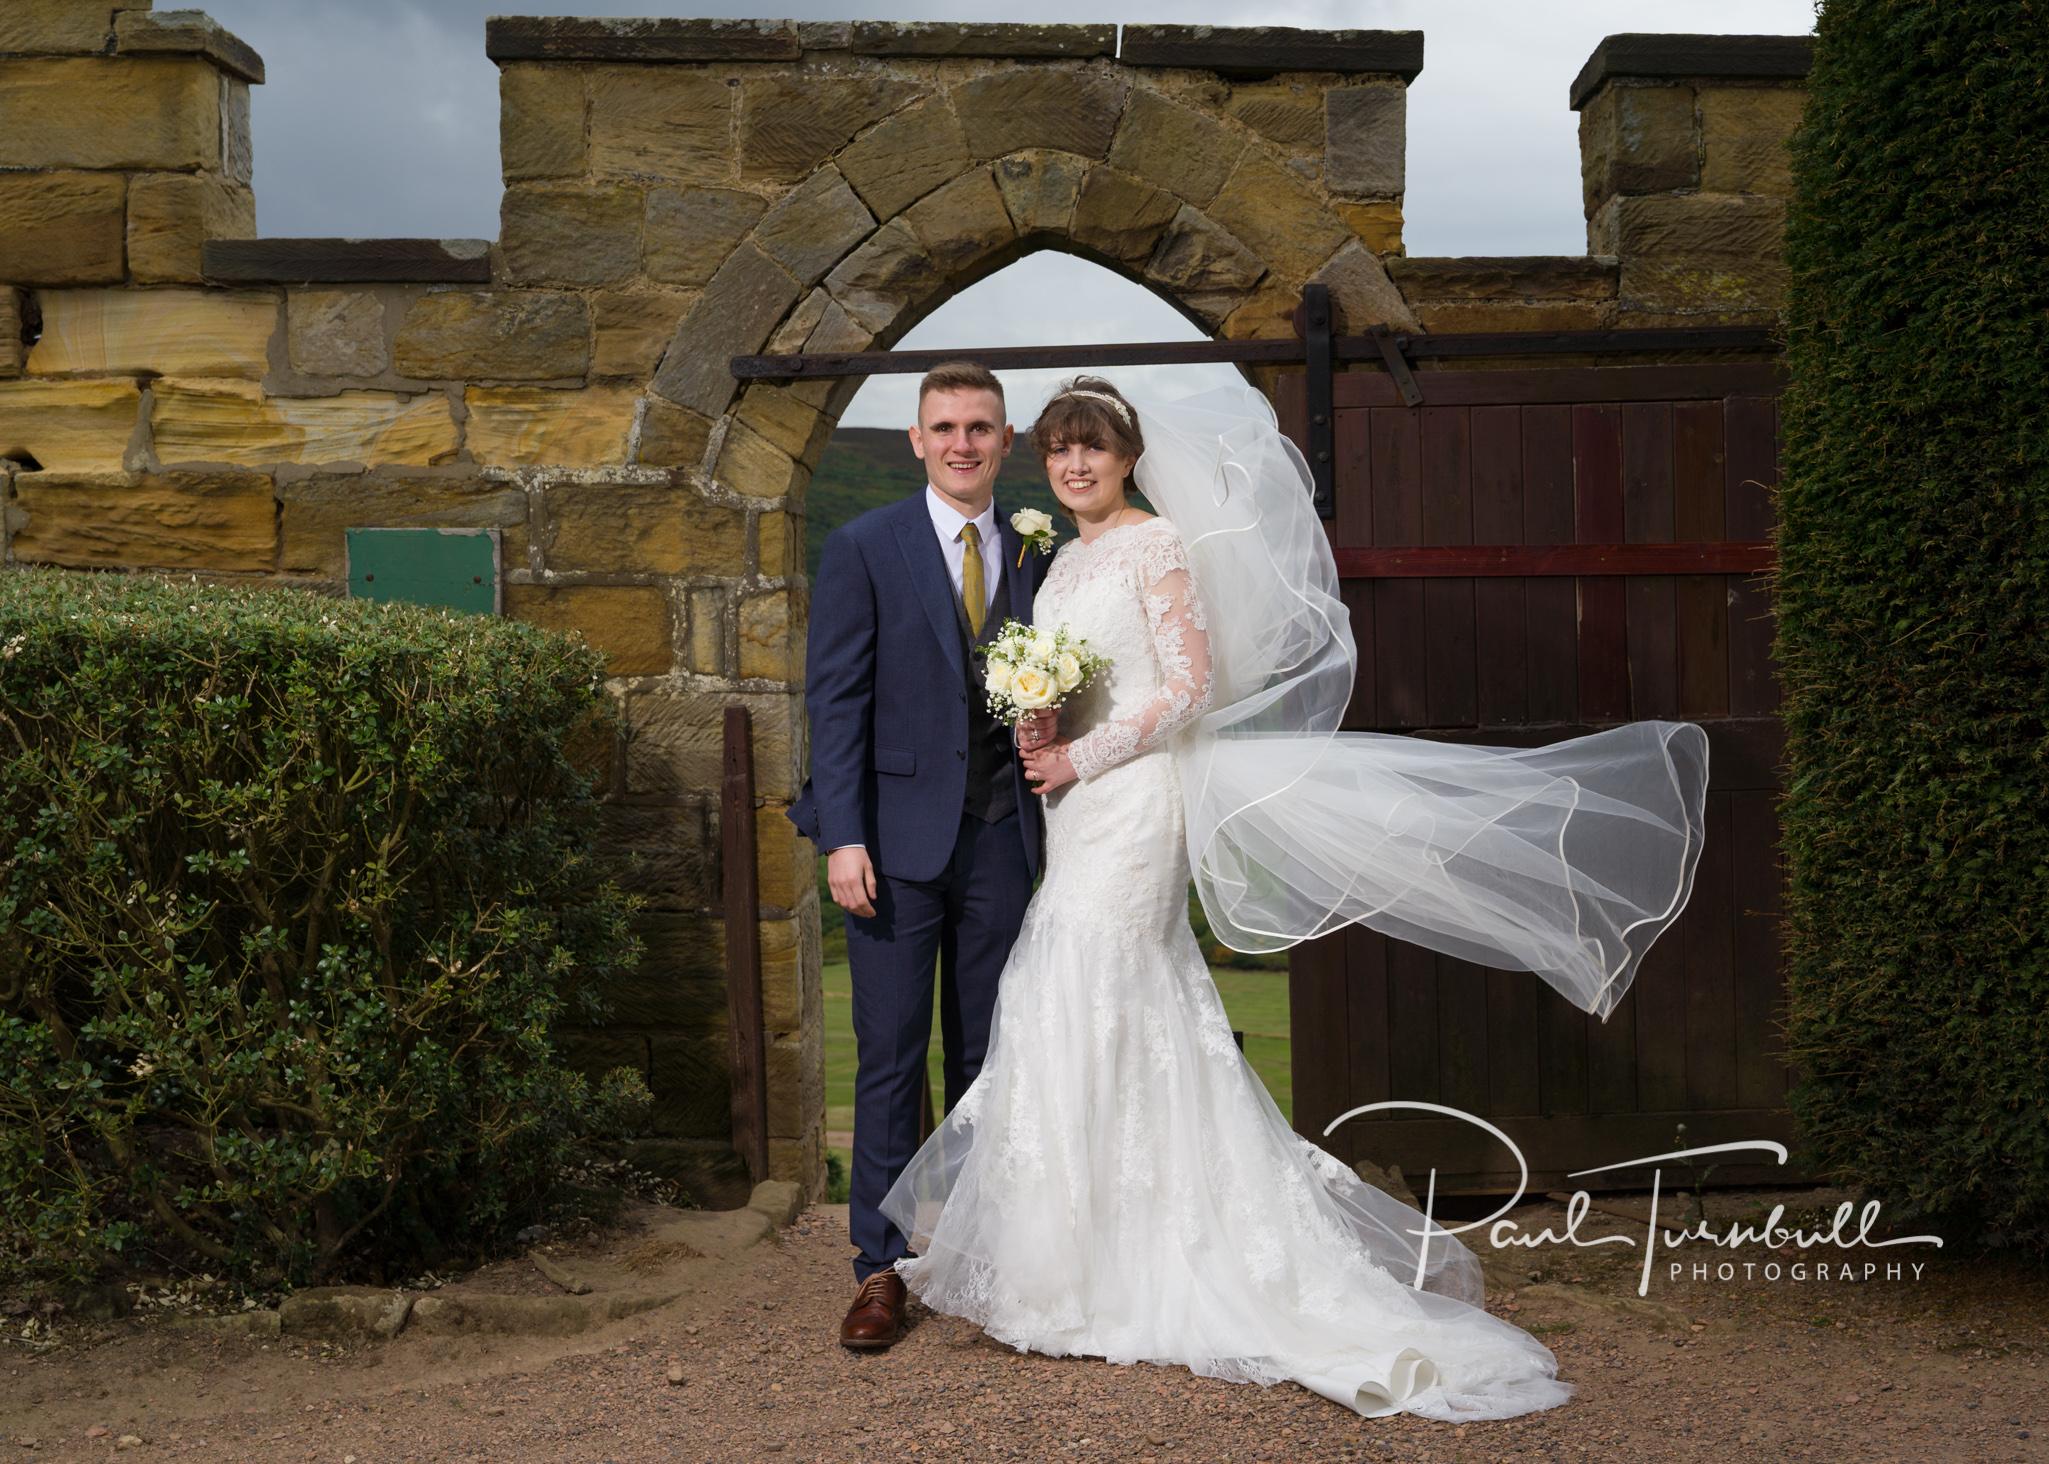 wedding-photographer-raven-hall-ravenscroft--scarborough-yorkshire-lucy-ryan-068.jpg